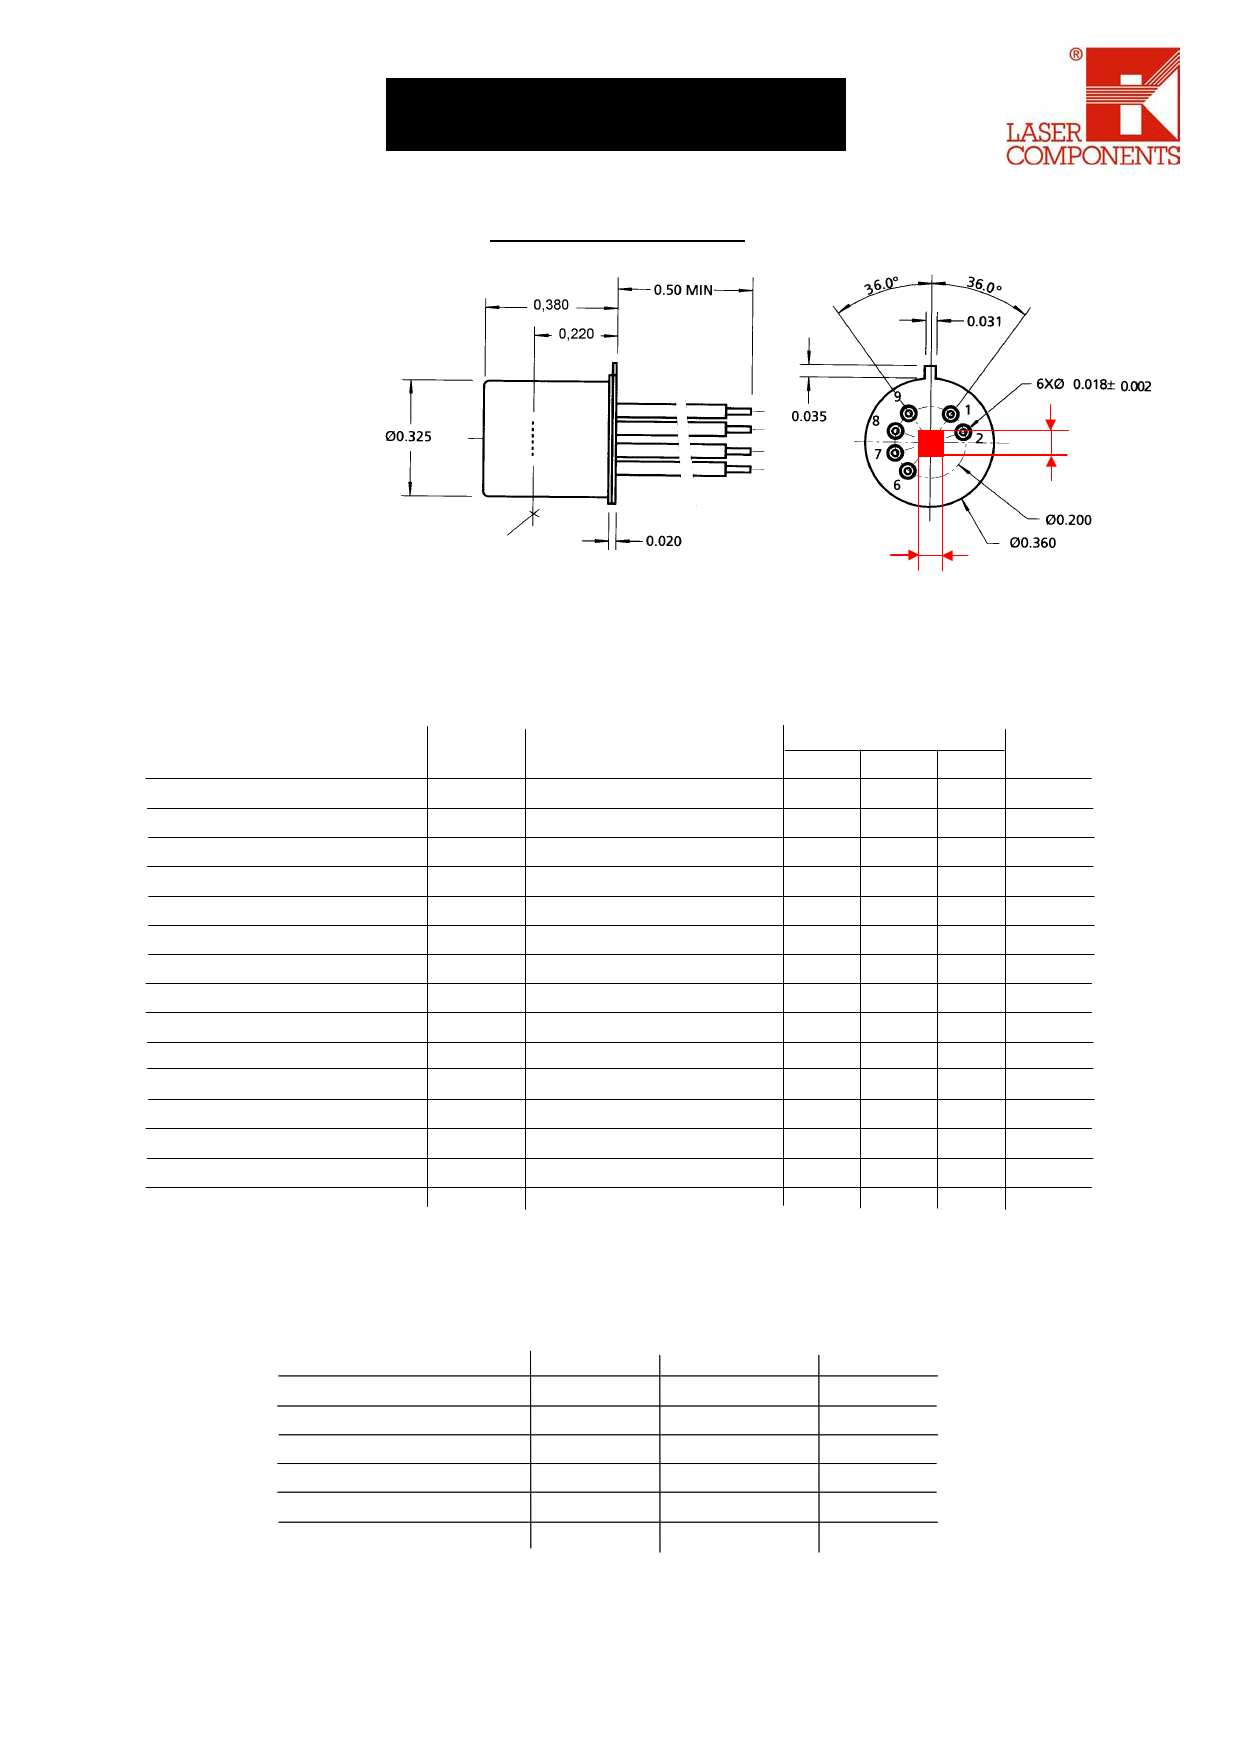 V-850 datasheet